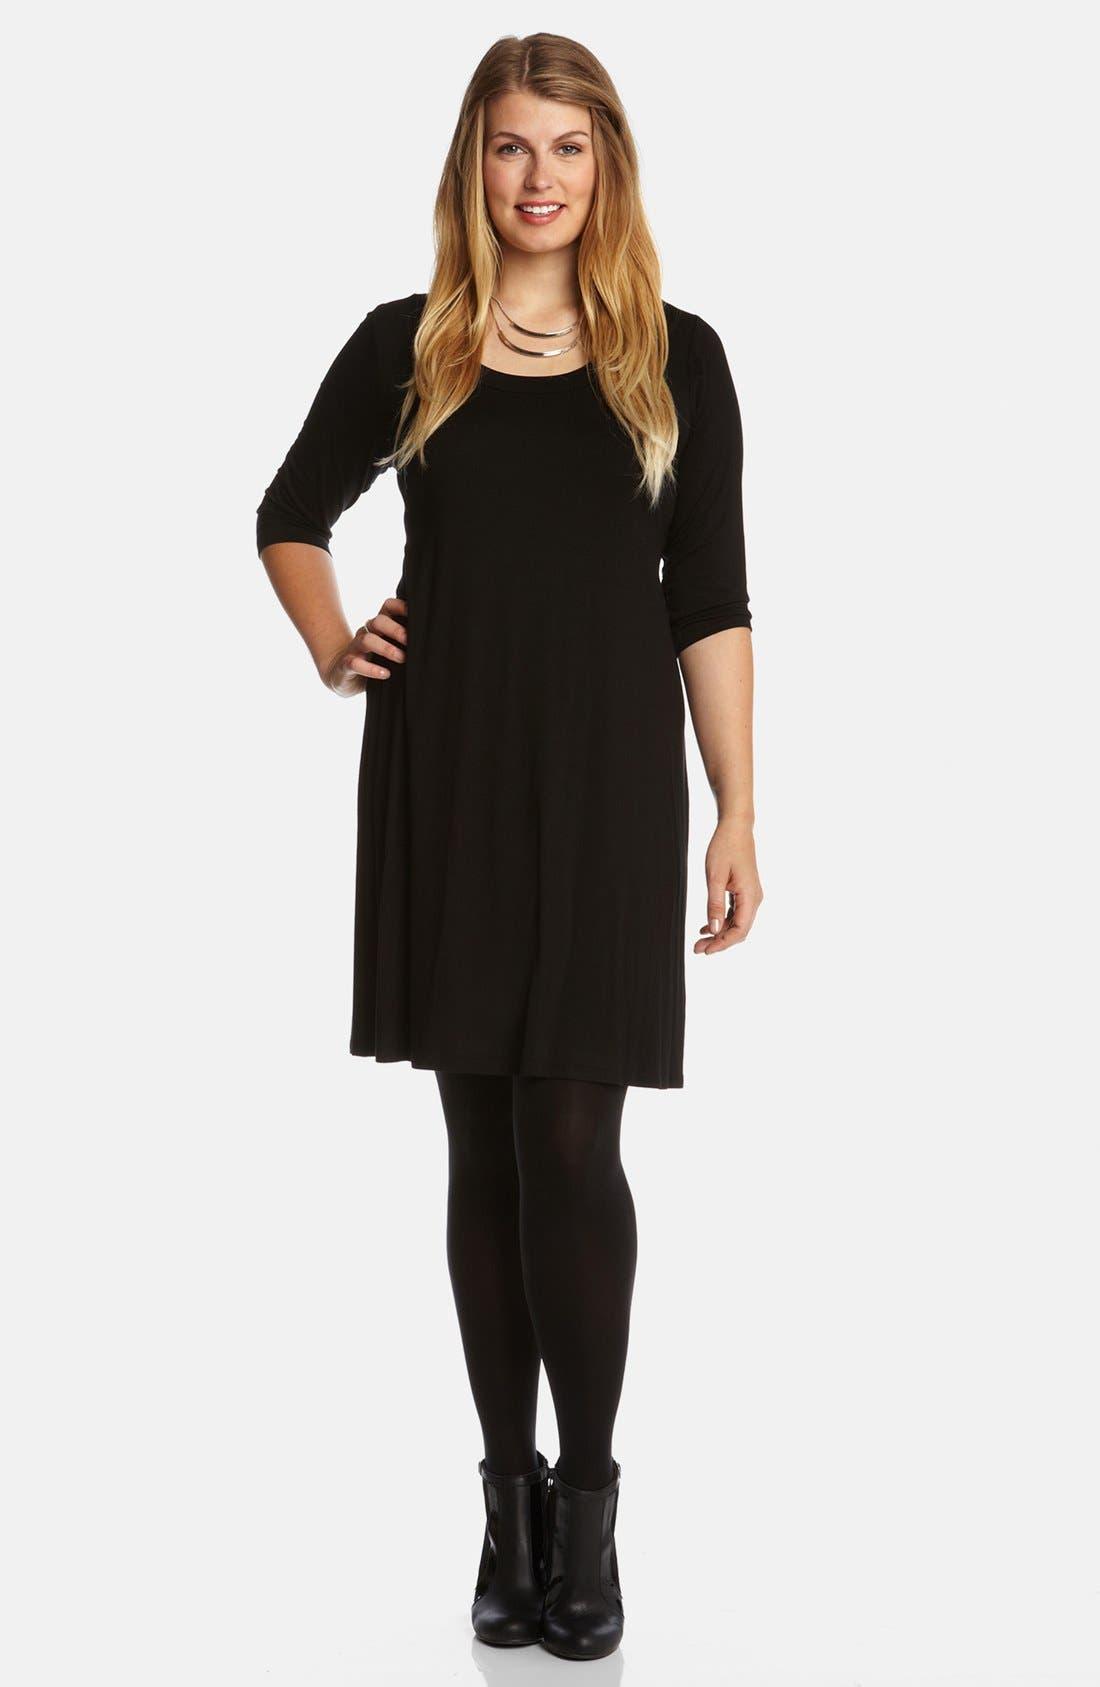 Plus Size Black Dresses Cheap